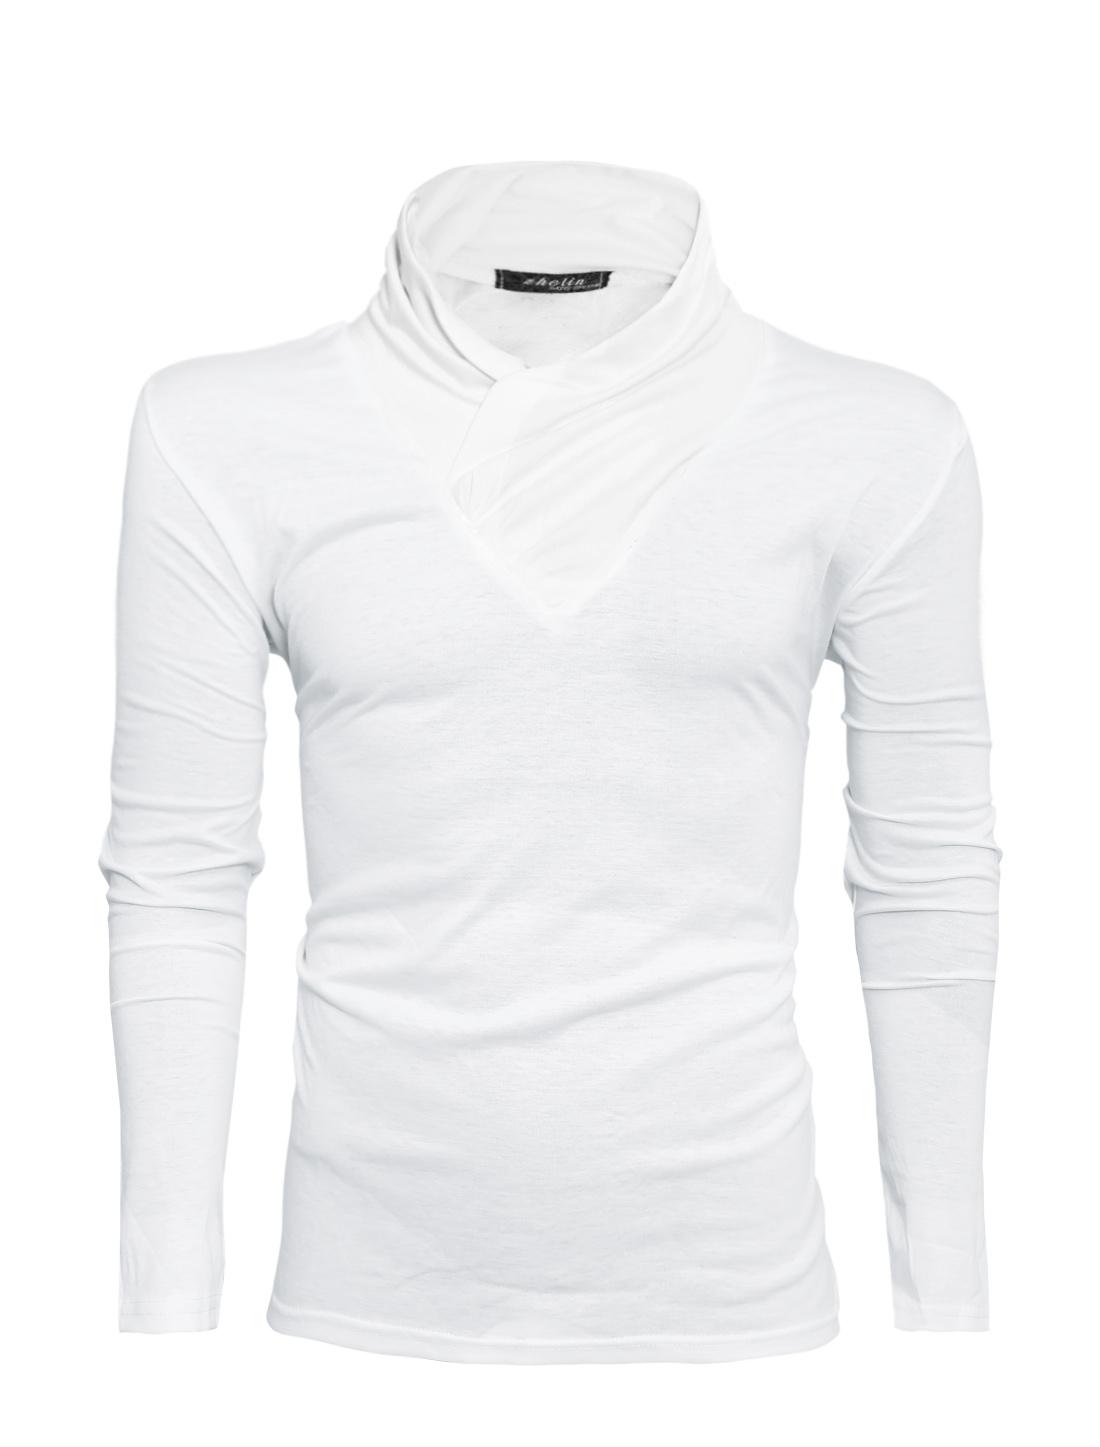 Men Long Sleeve Slim Fit Casual T-Shirt Sweatshirt White M